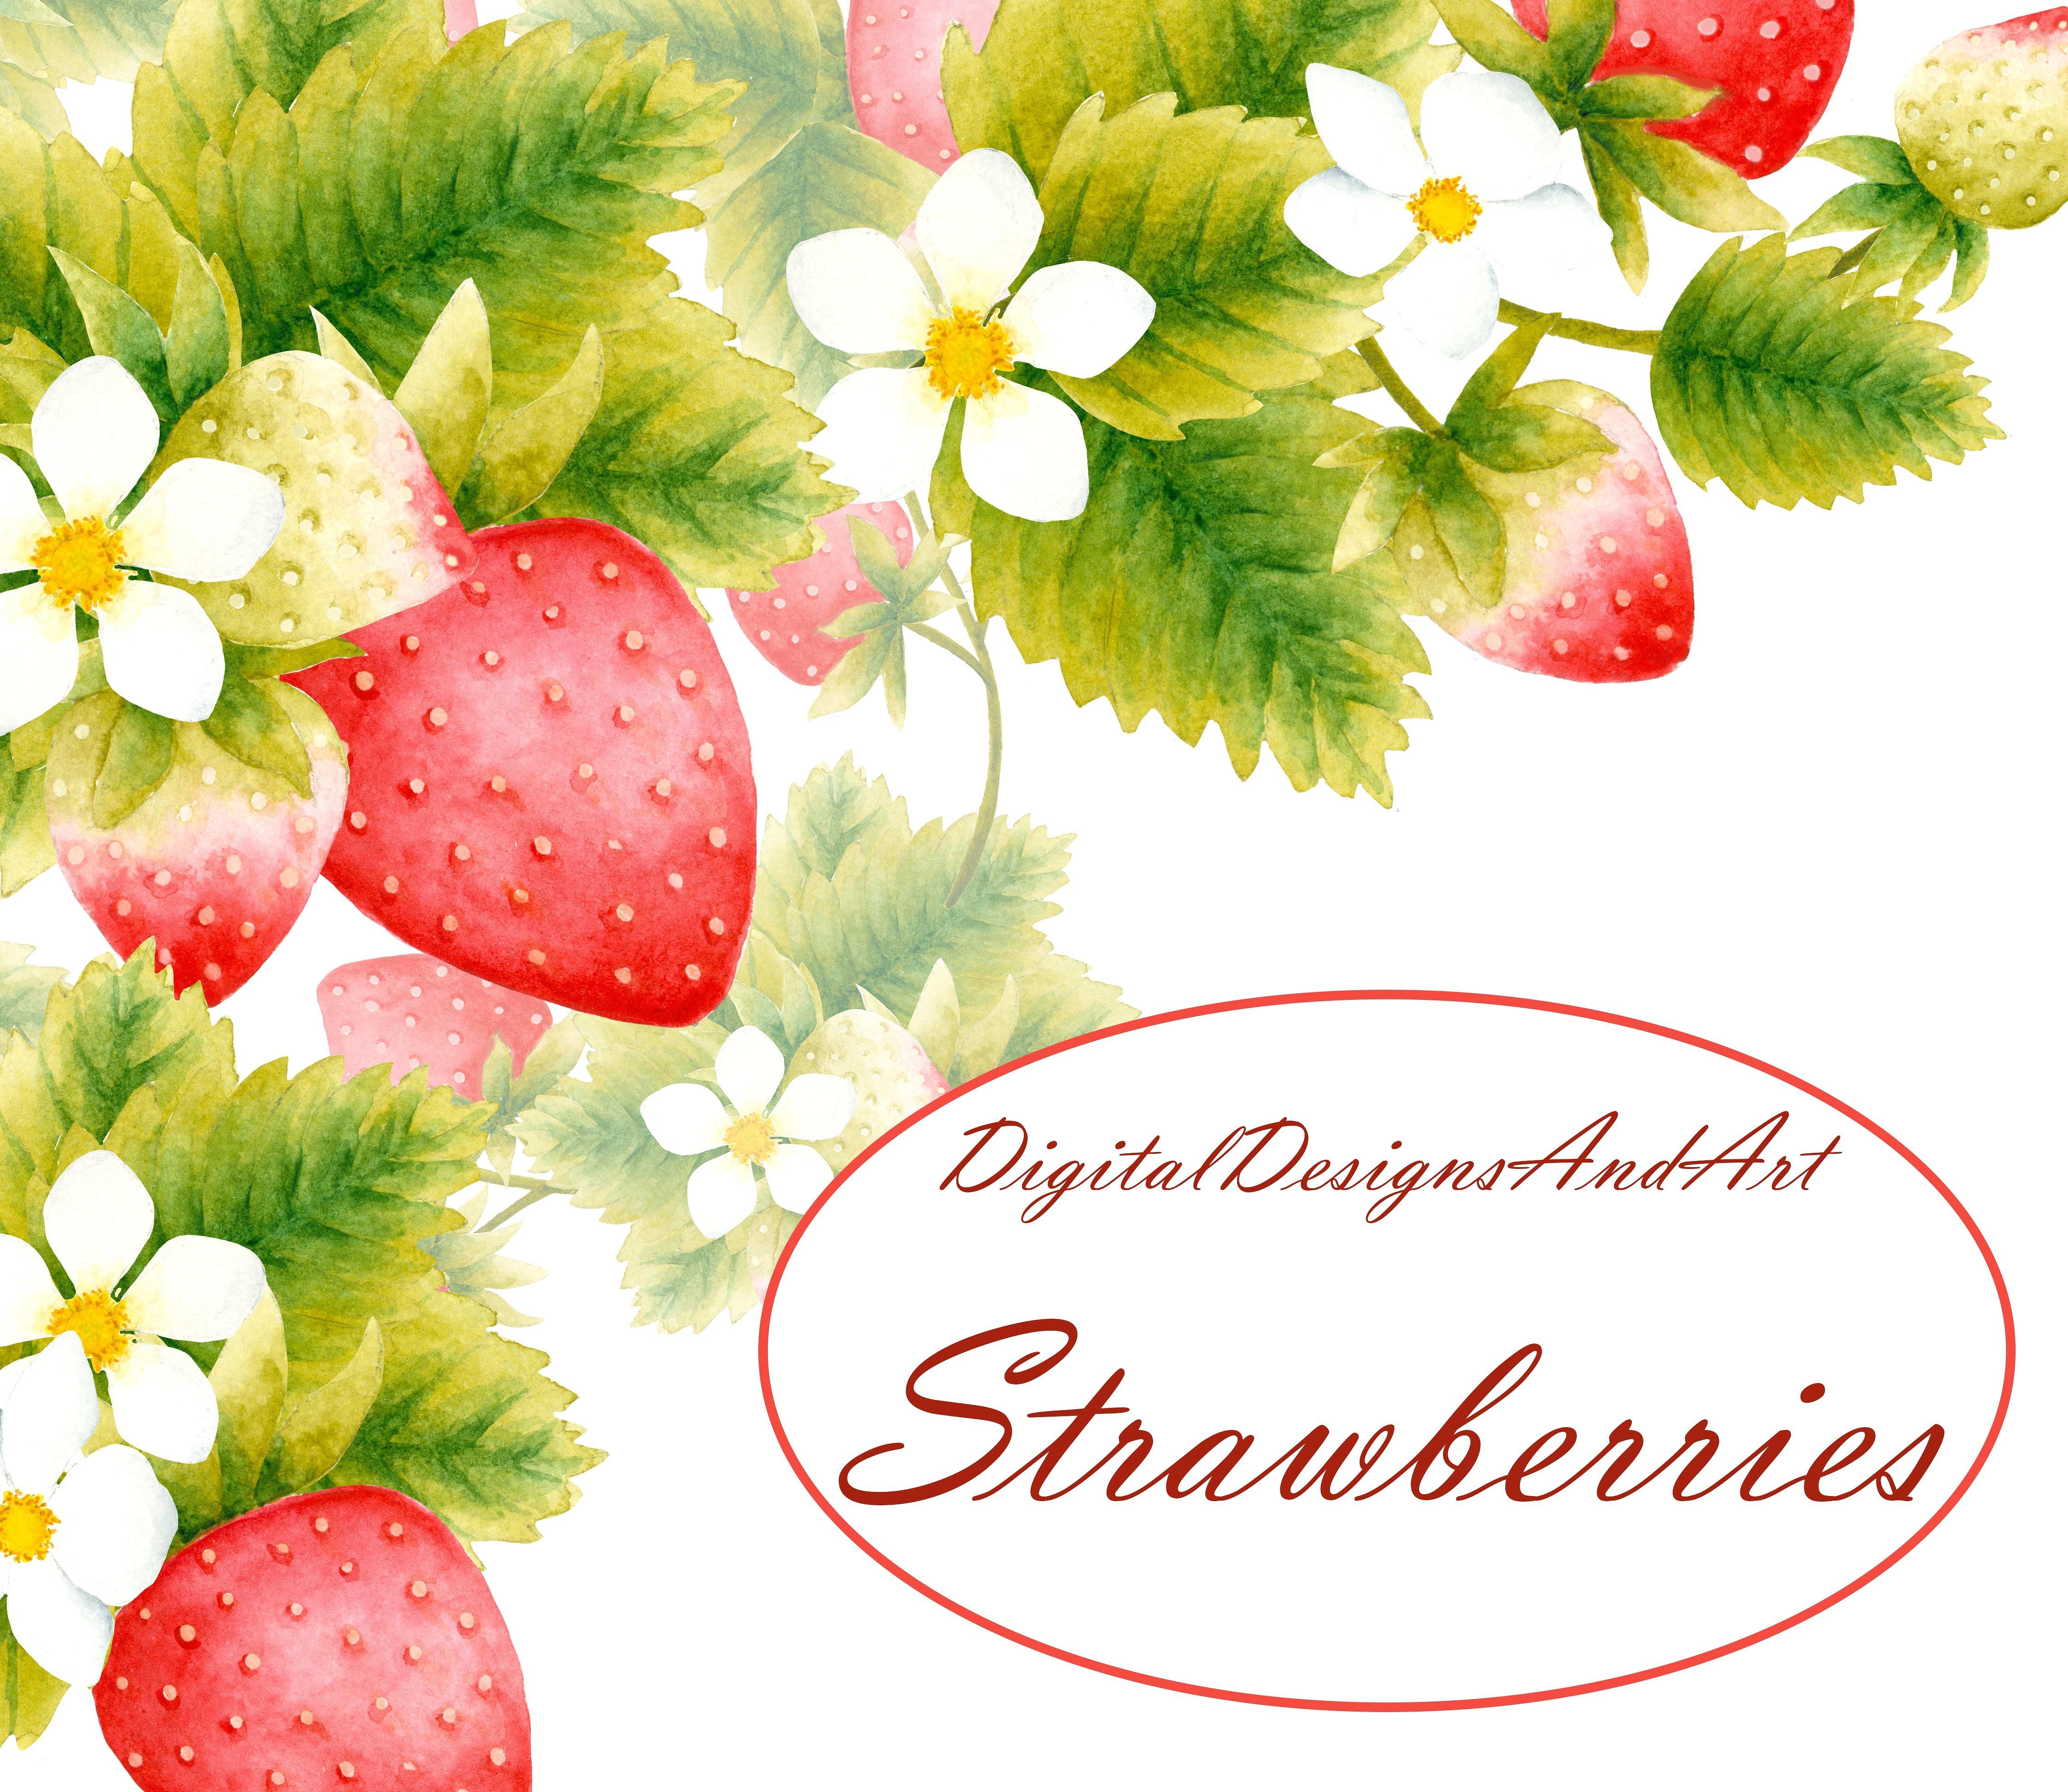 Strawberry illustrations creative market. Berries clipart single